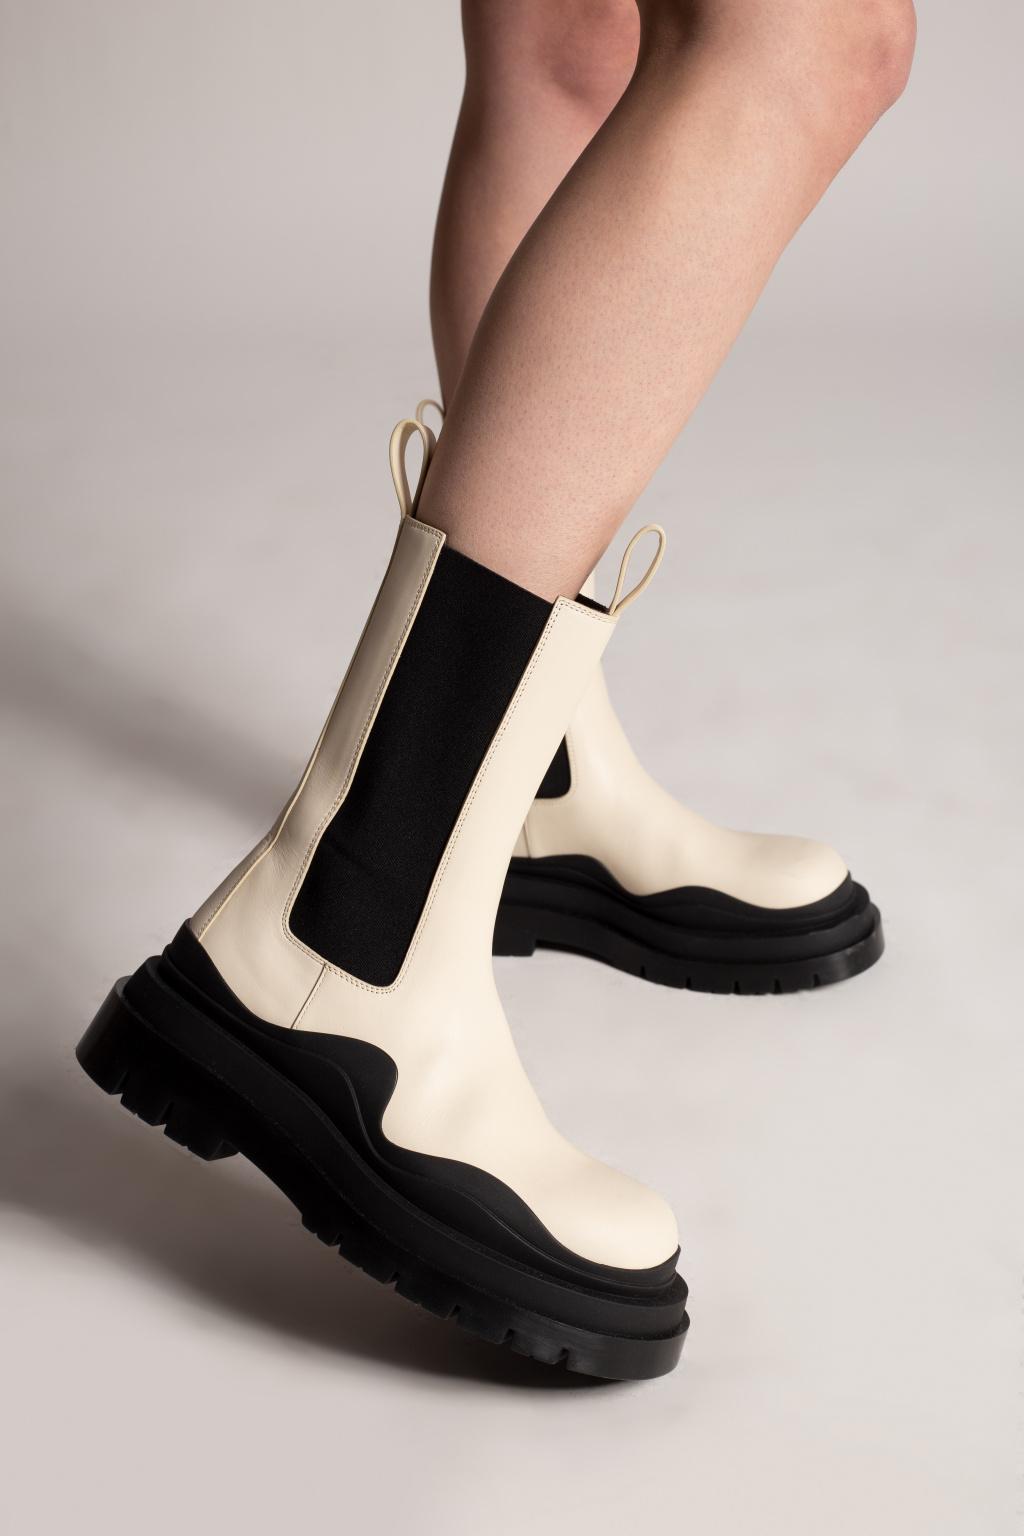 Bottega Veneta 'The Tire' platform Chelsea boots